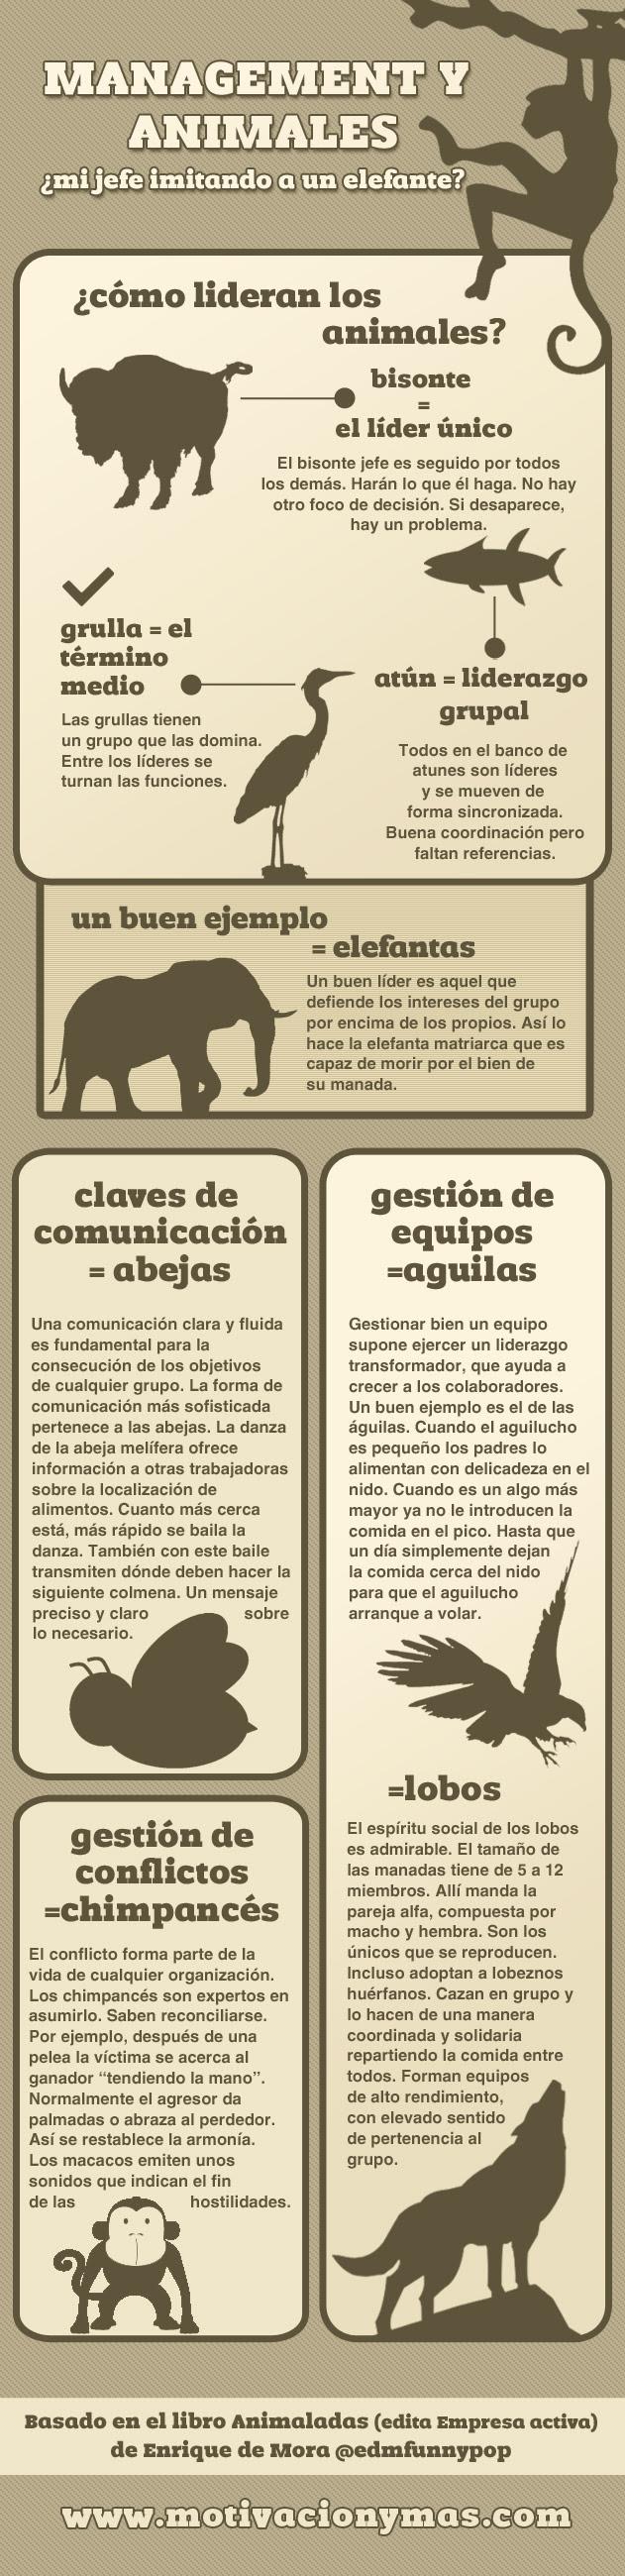 Mangement y animales